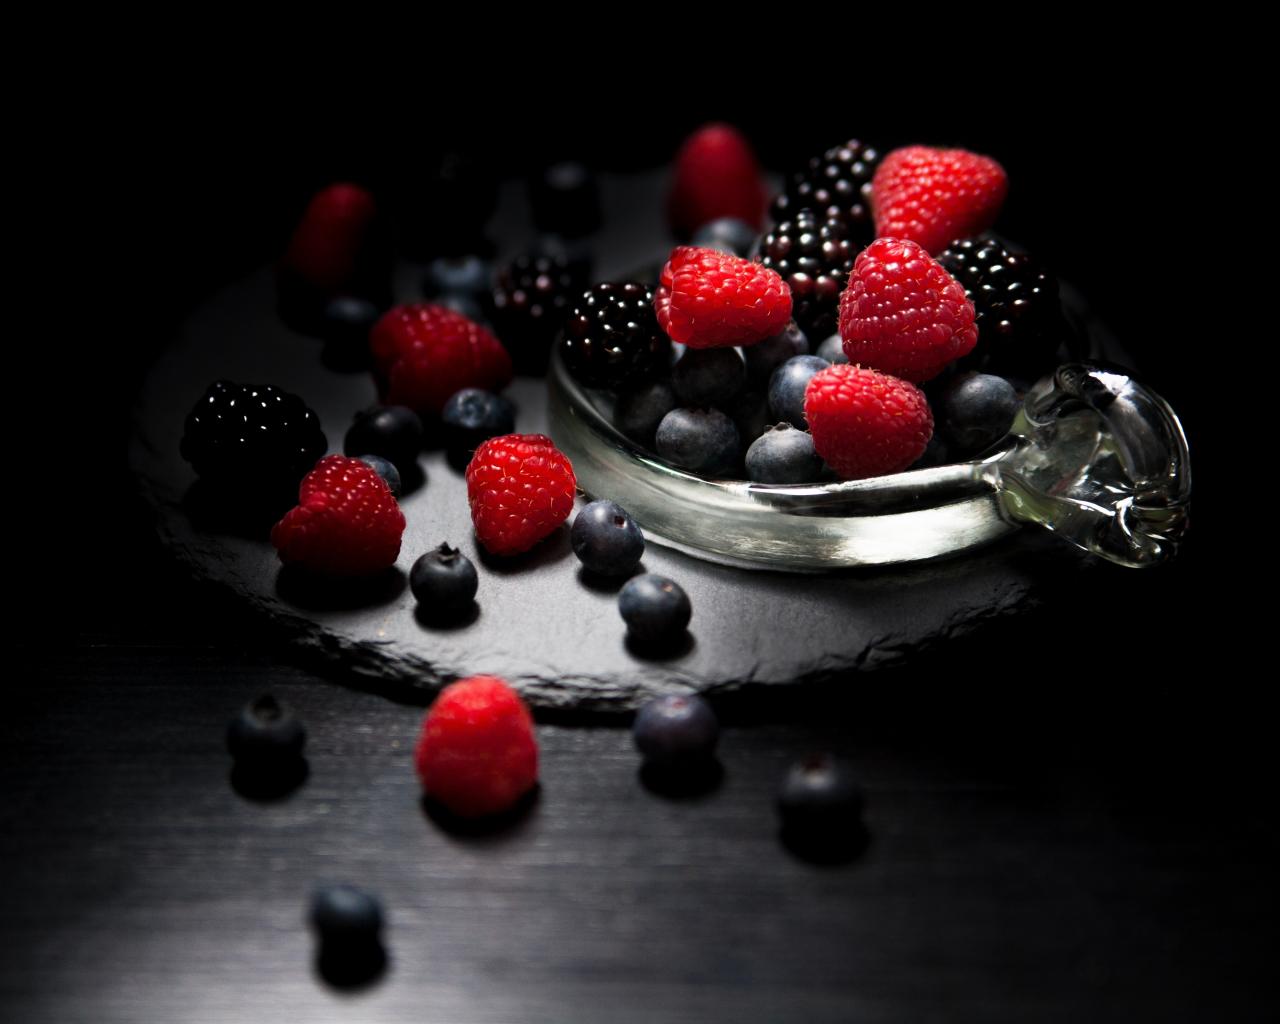 Dark mood, food, fruits, Raspberry, blueberry, Blackberry, 1280x1024 wallpaper